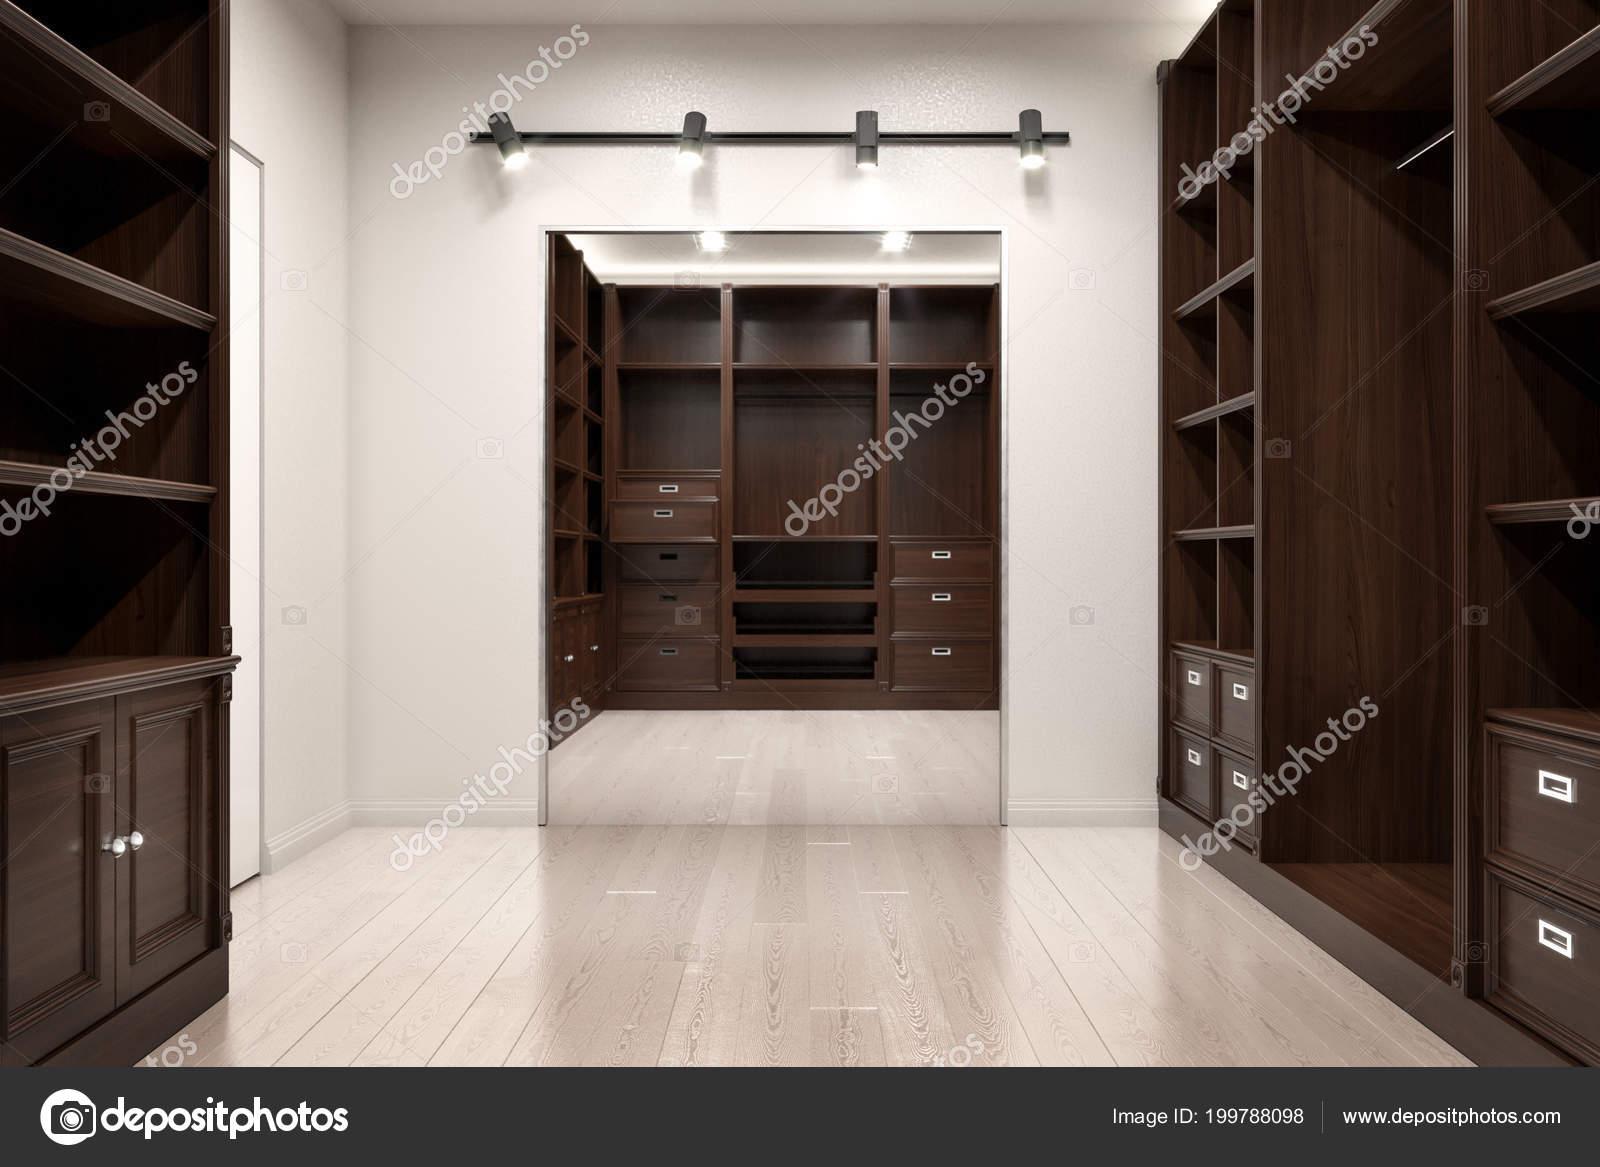 Mooie houten horizontale kledingkast inloopkast illustratie